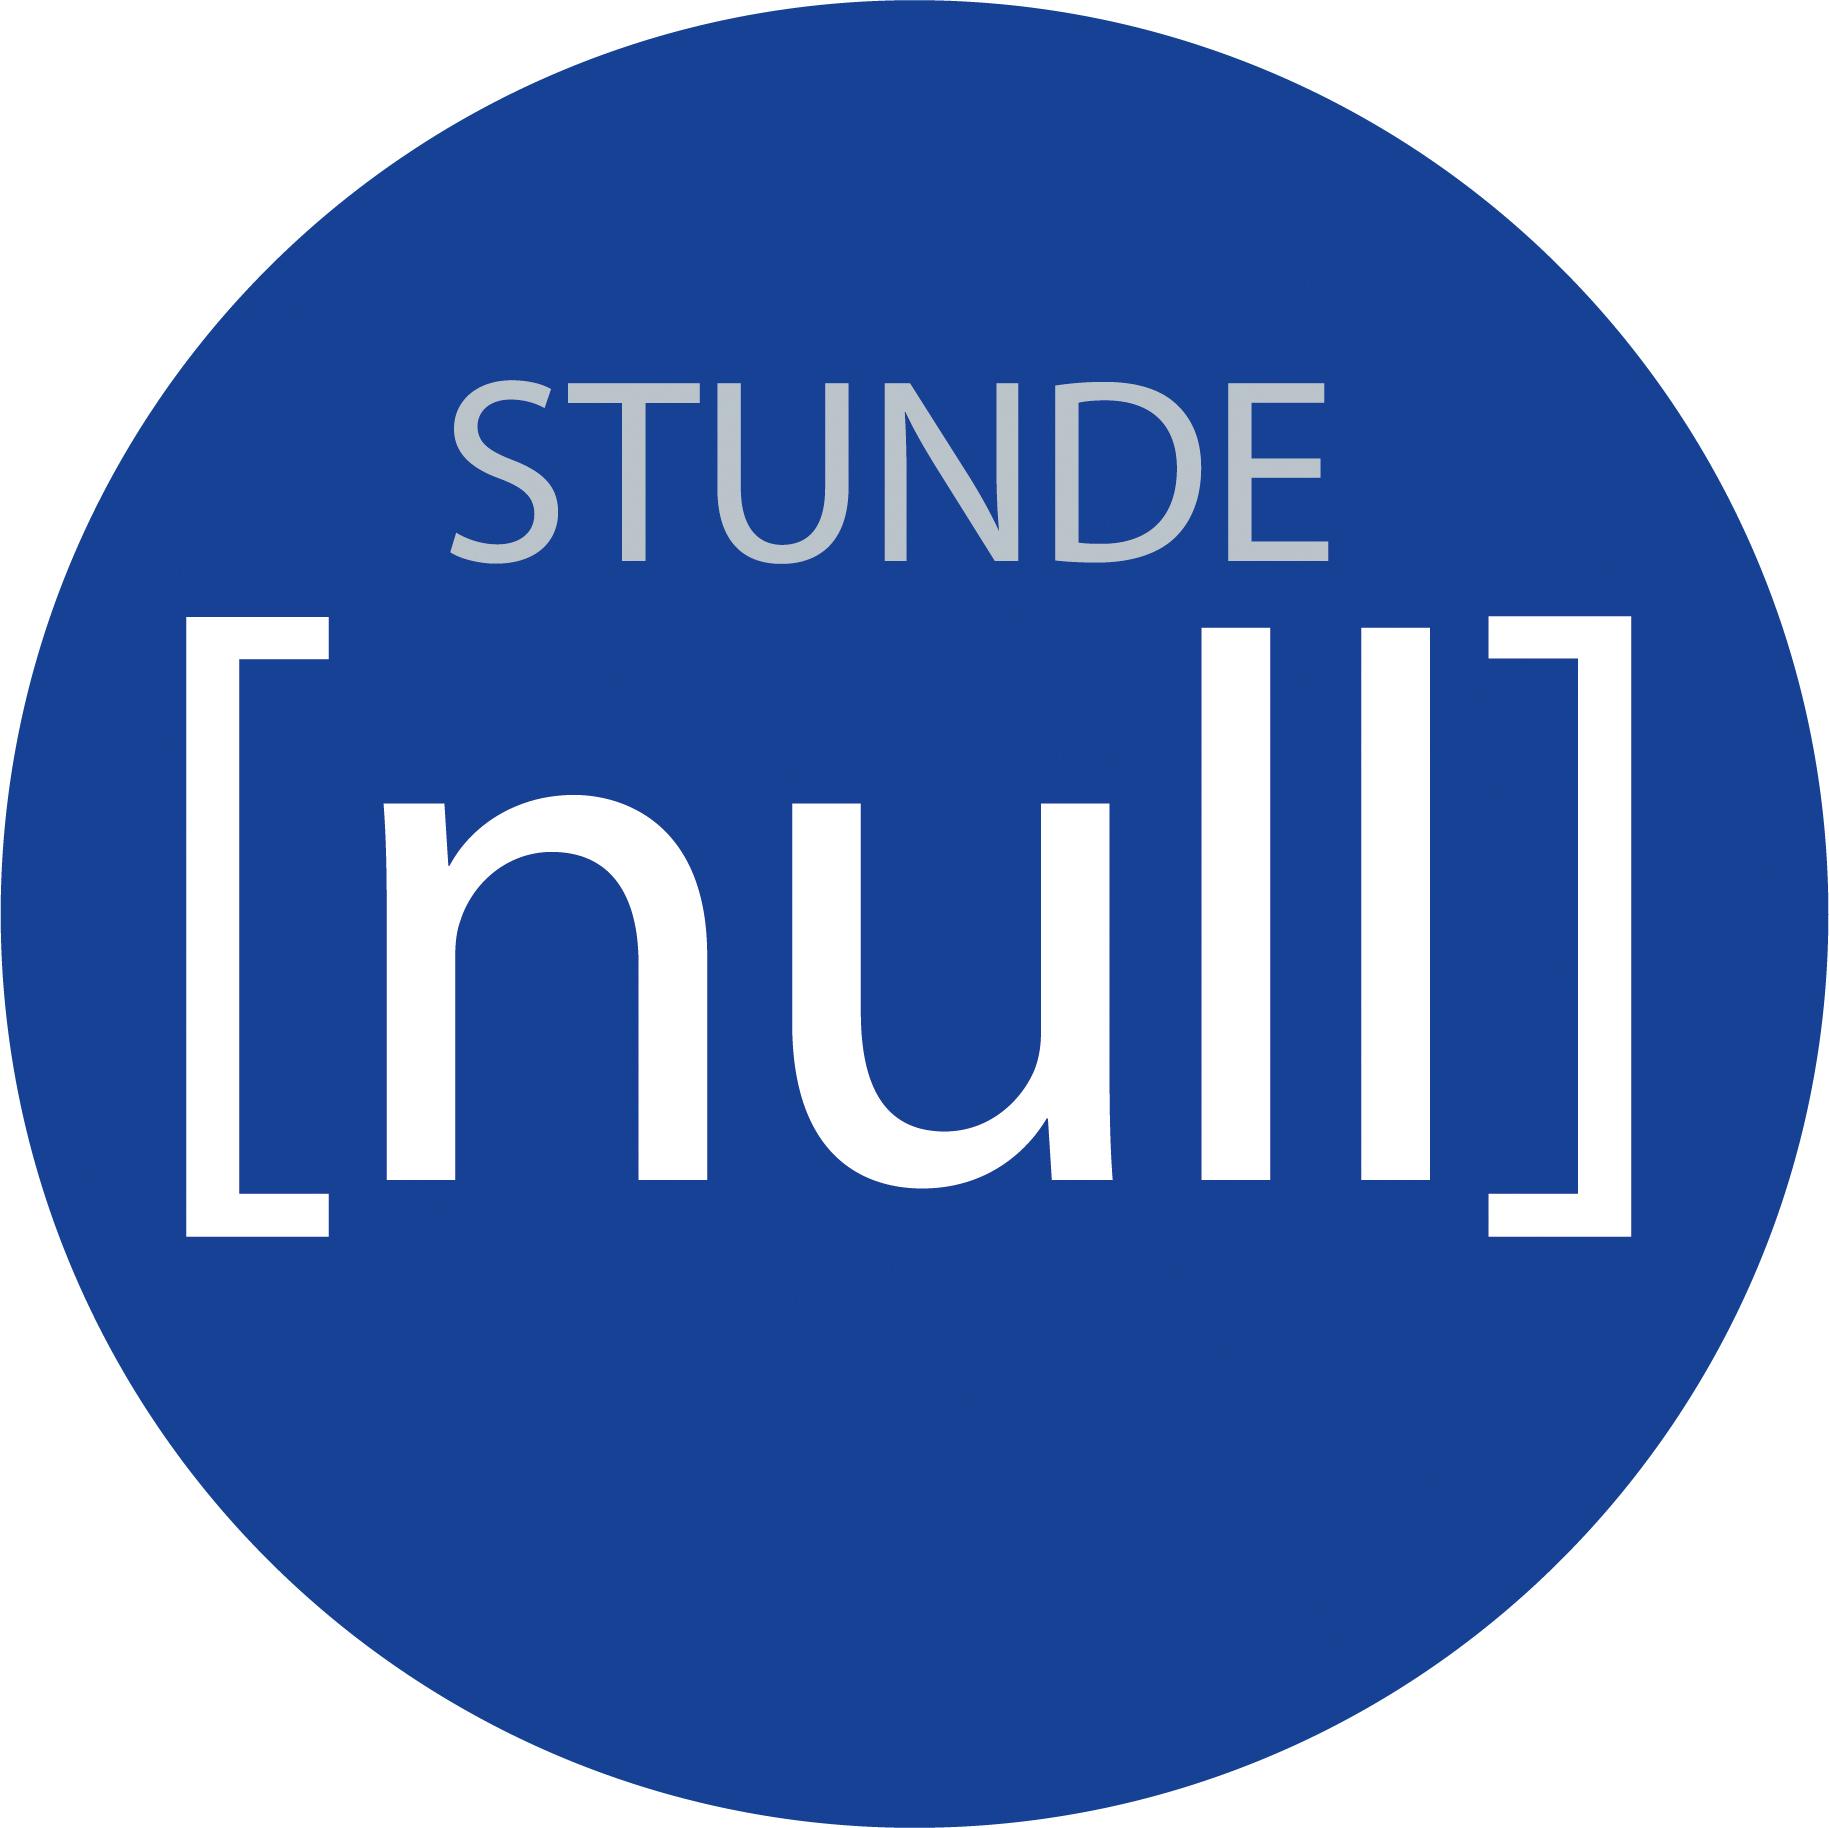 Stunde Null Logo